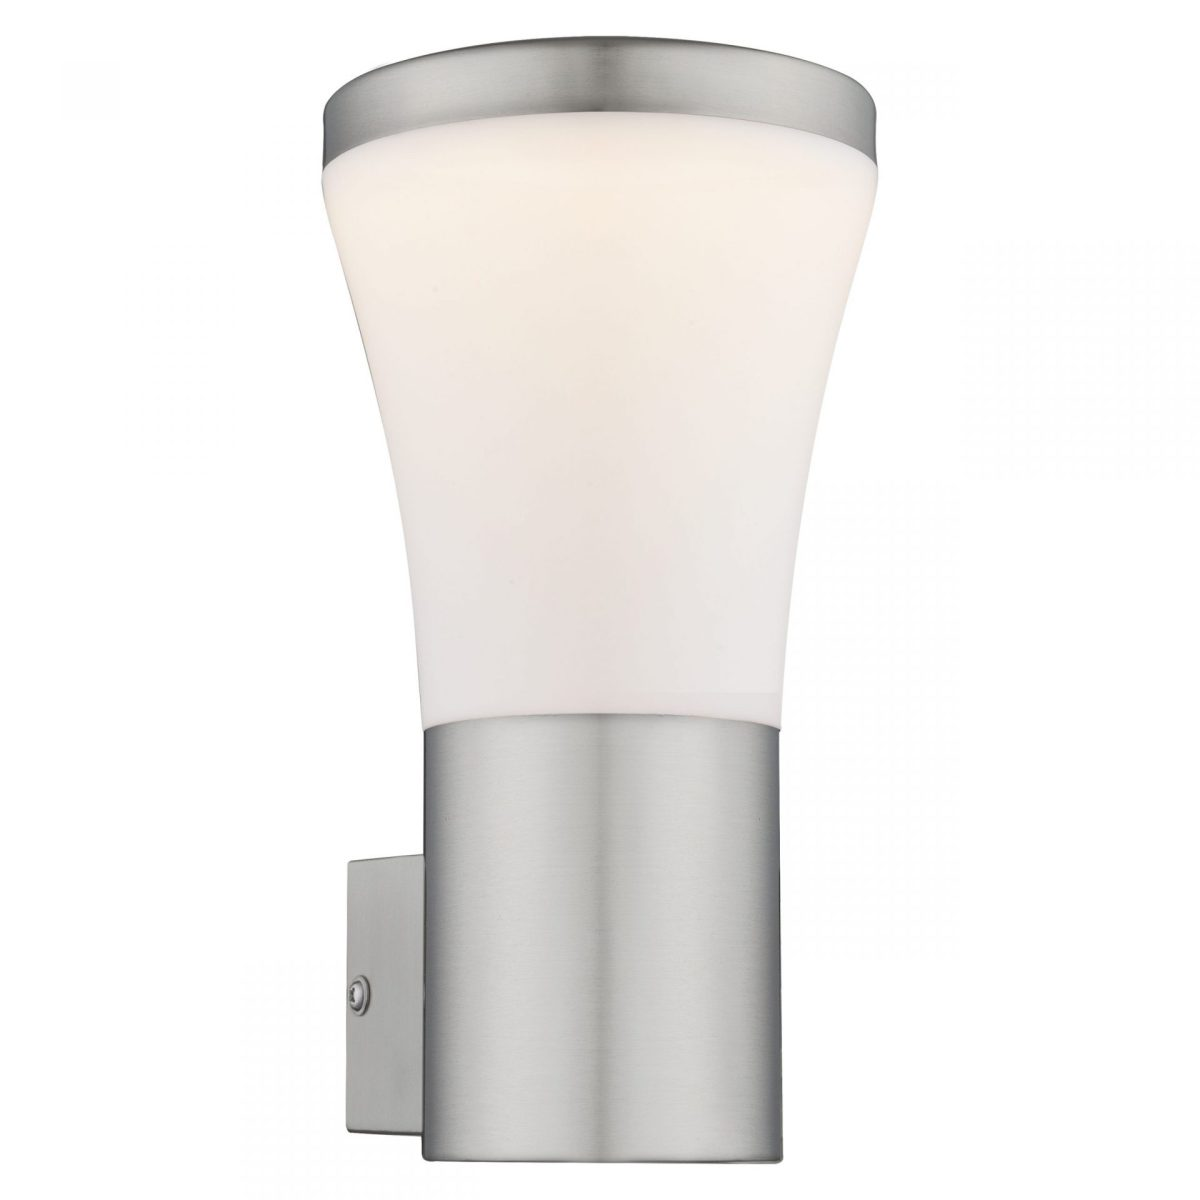 Outdoor Lighting Waterproof Wall Light WL-B3 – COMING SOON